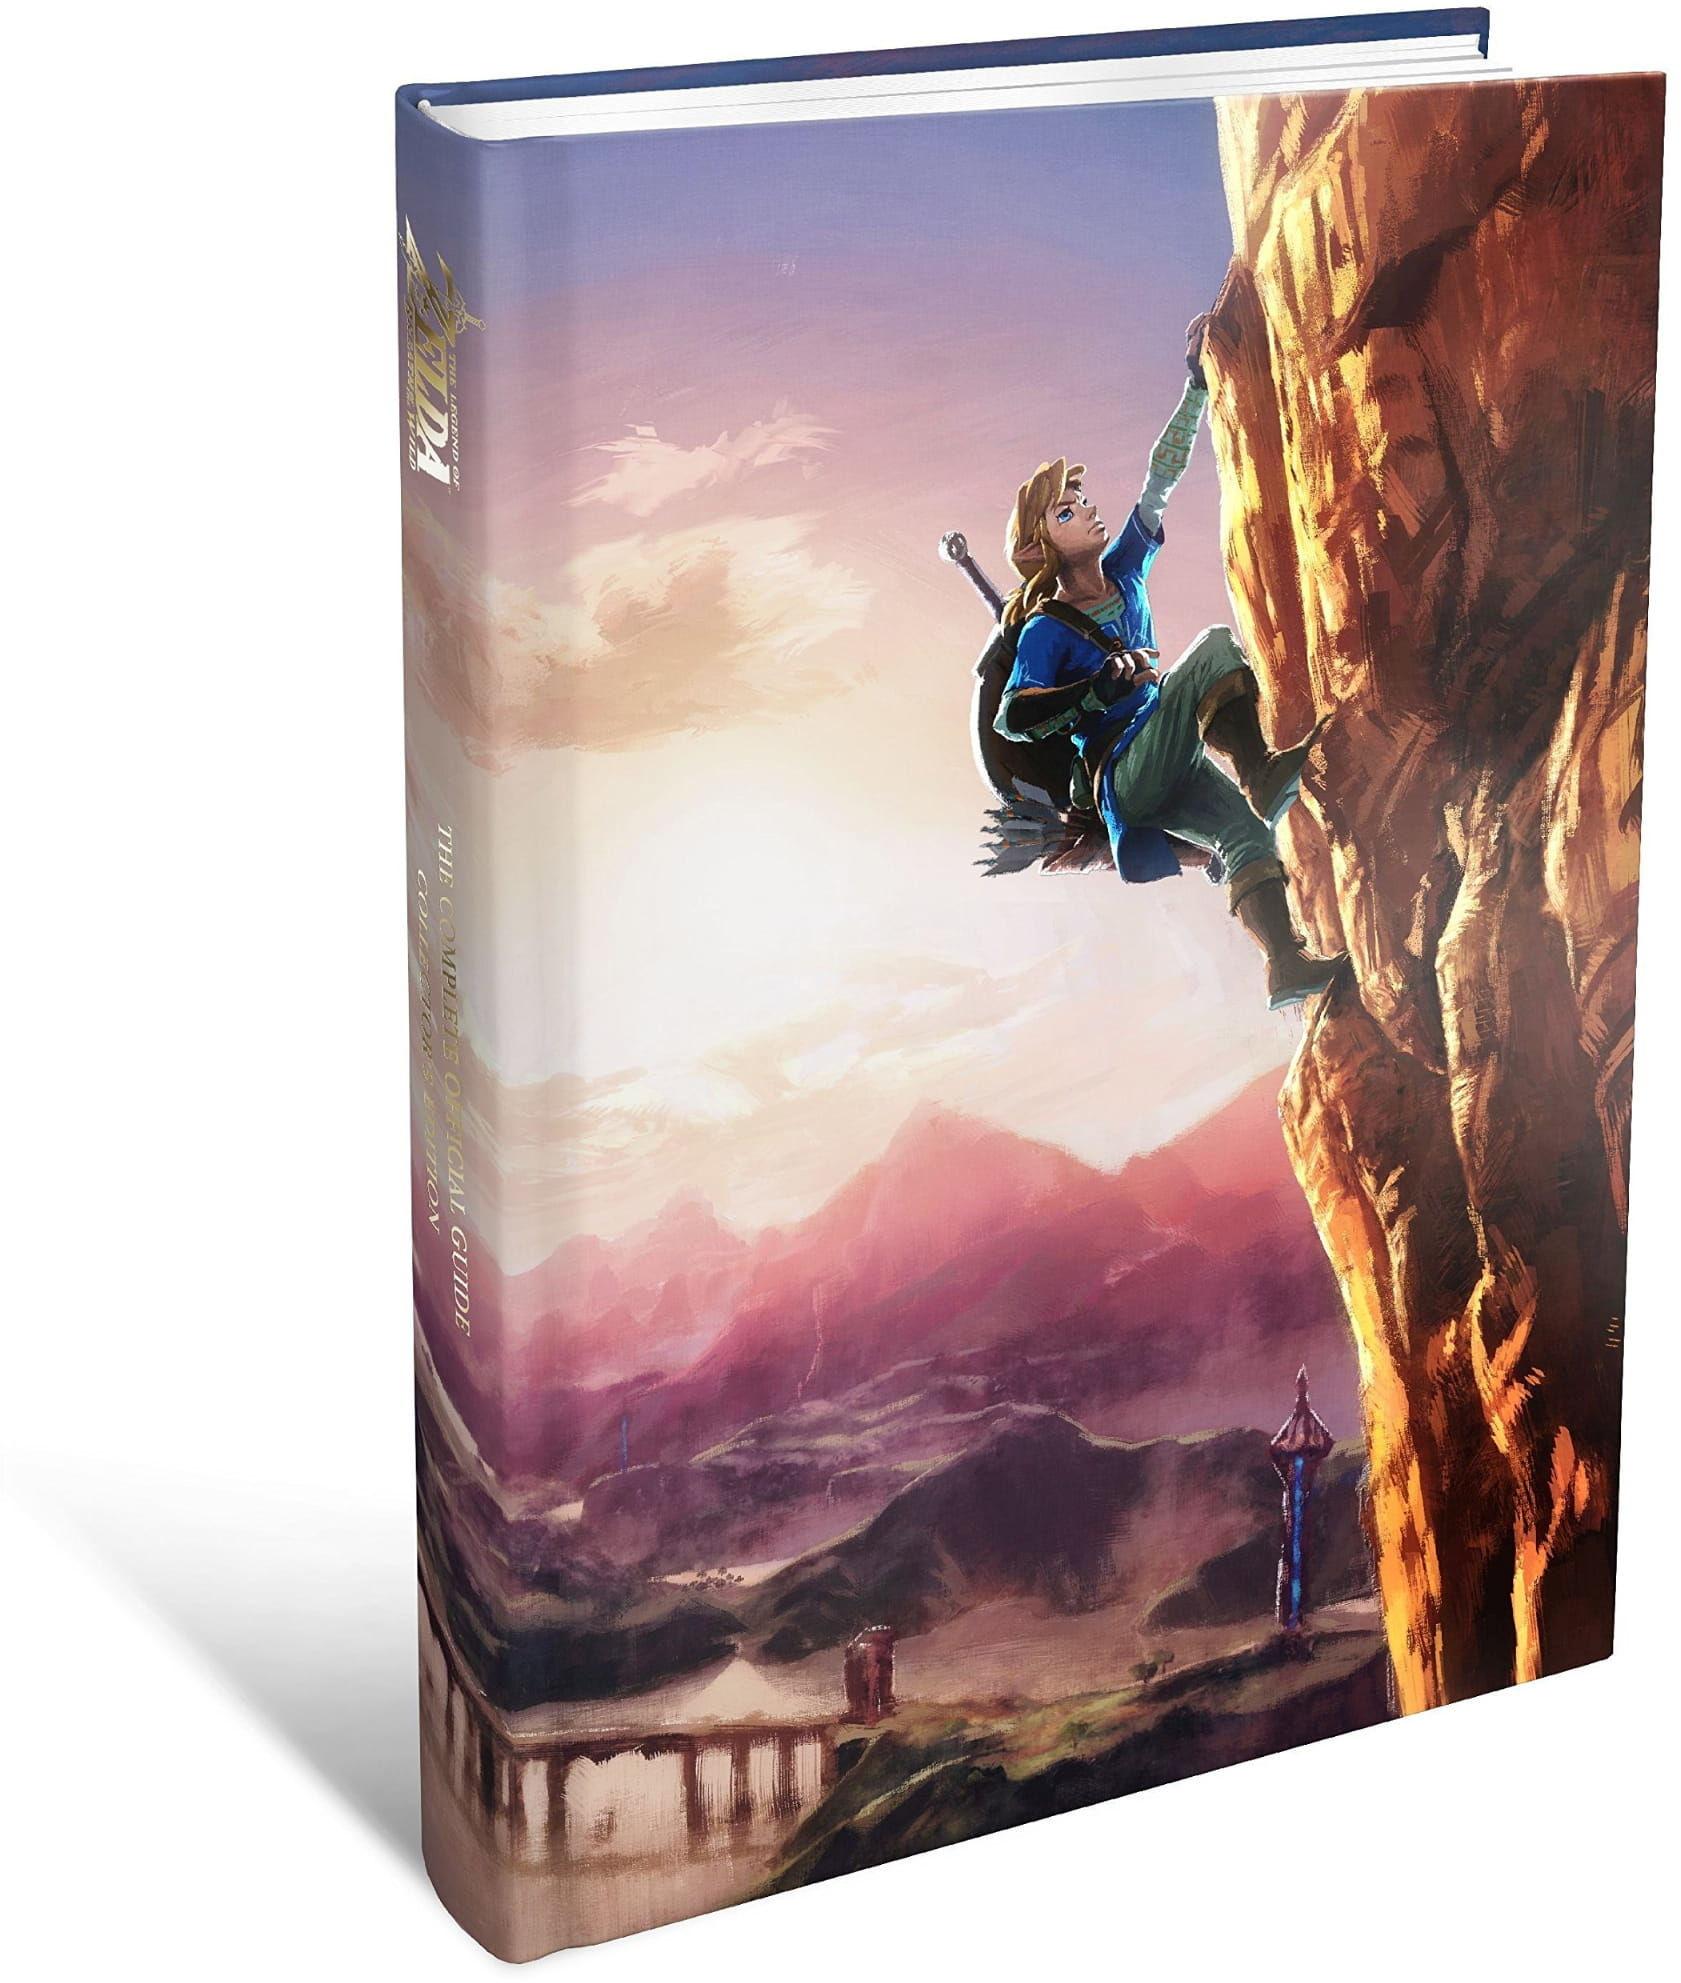 Książka The Legend of Zelda: Breath of the Wild Official Guide Collectors Ed.